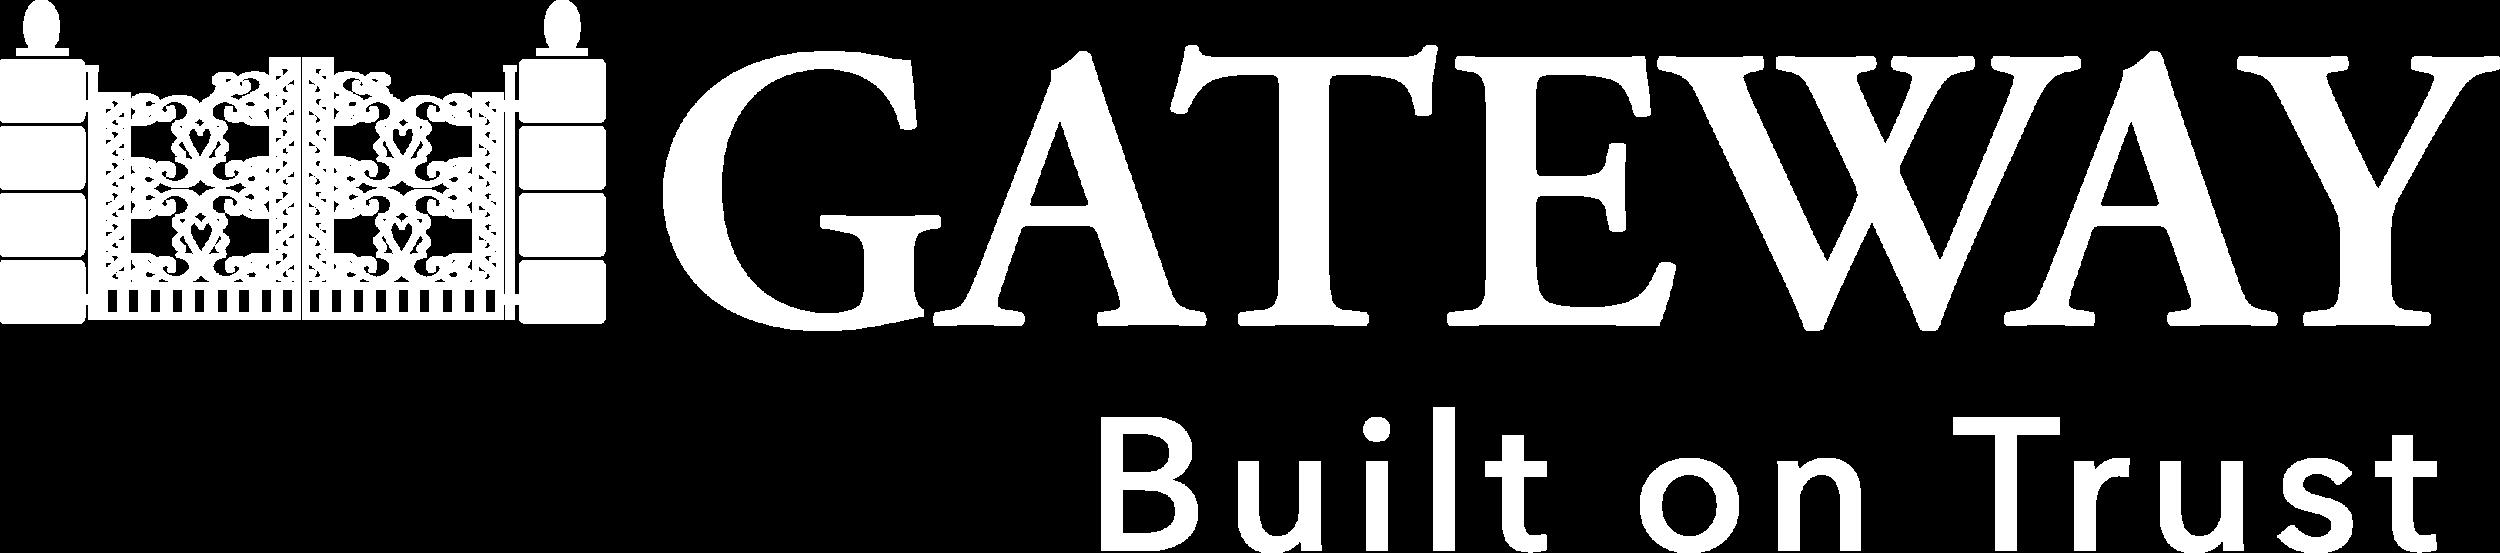 Gateway_Built_On_Trust_Logo_FINAL_DECEMBER-2016_HORIZONTAL-WH.png